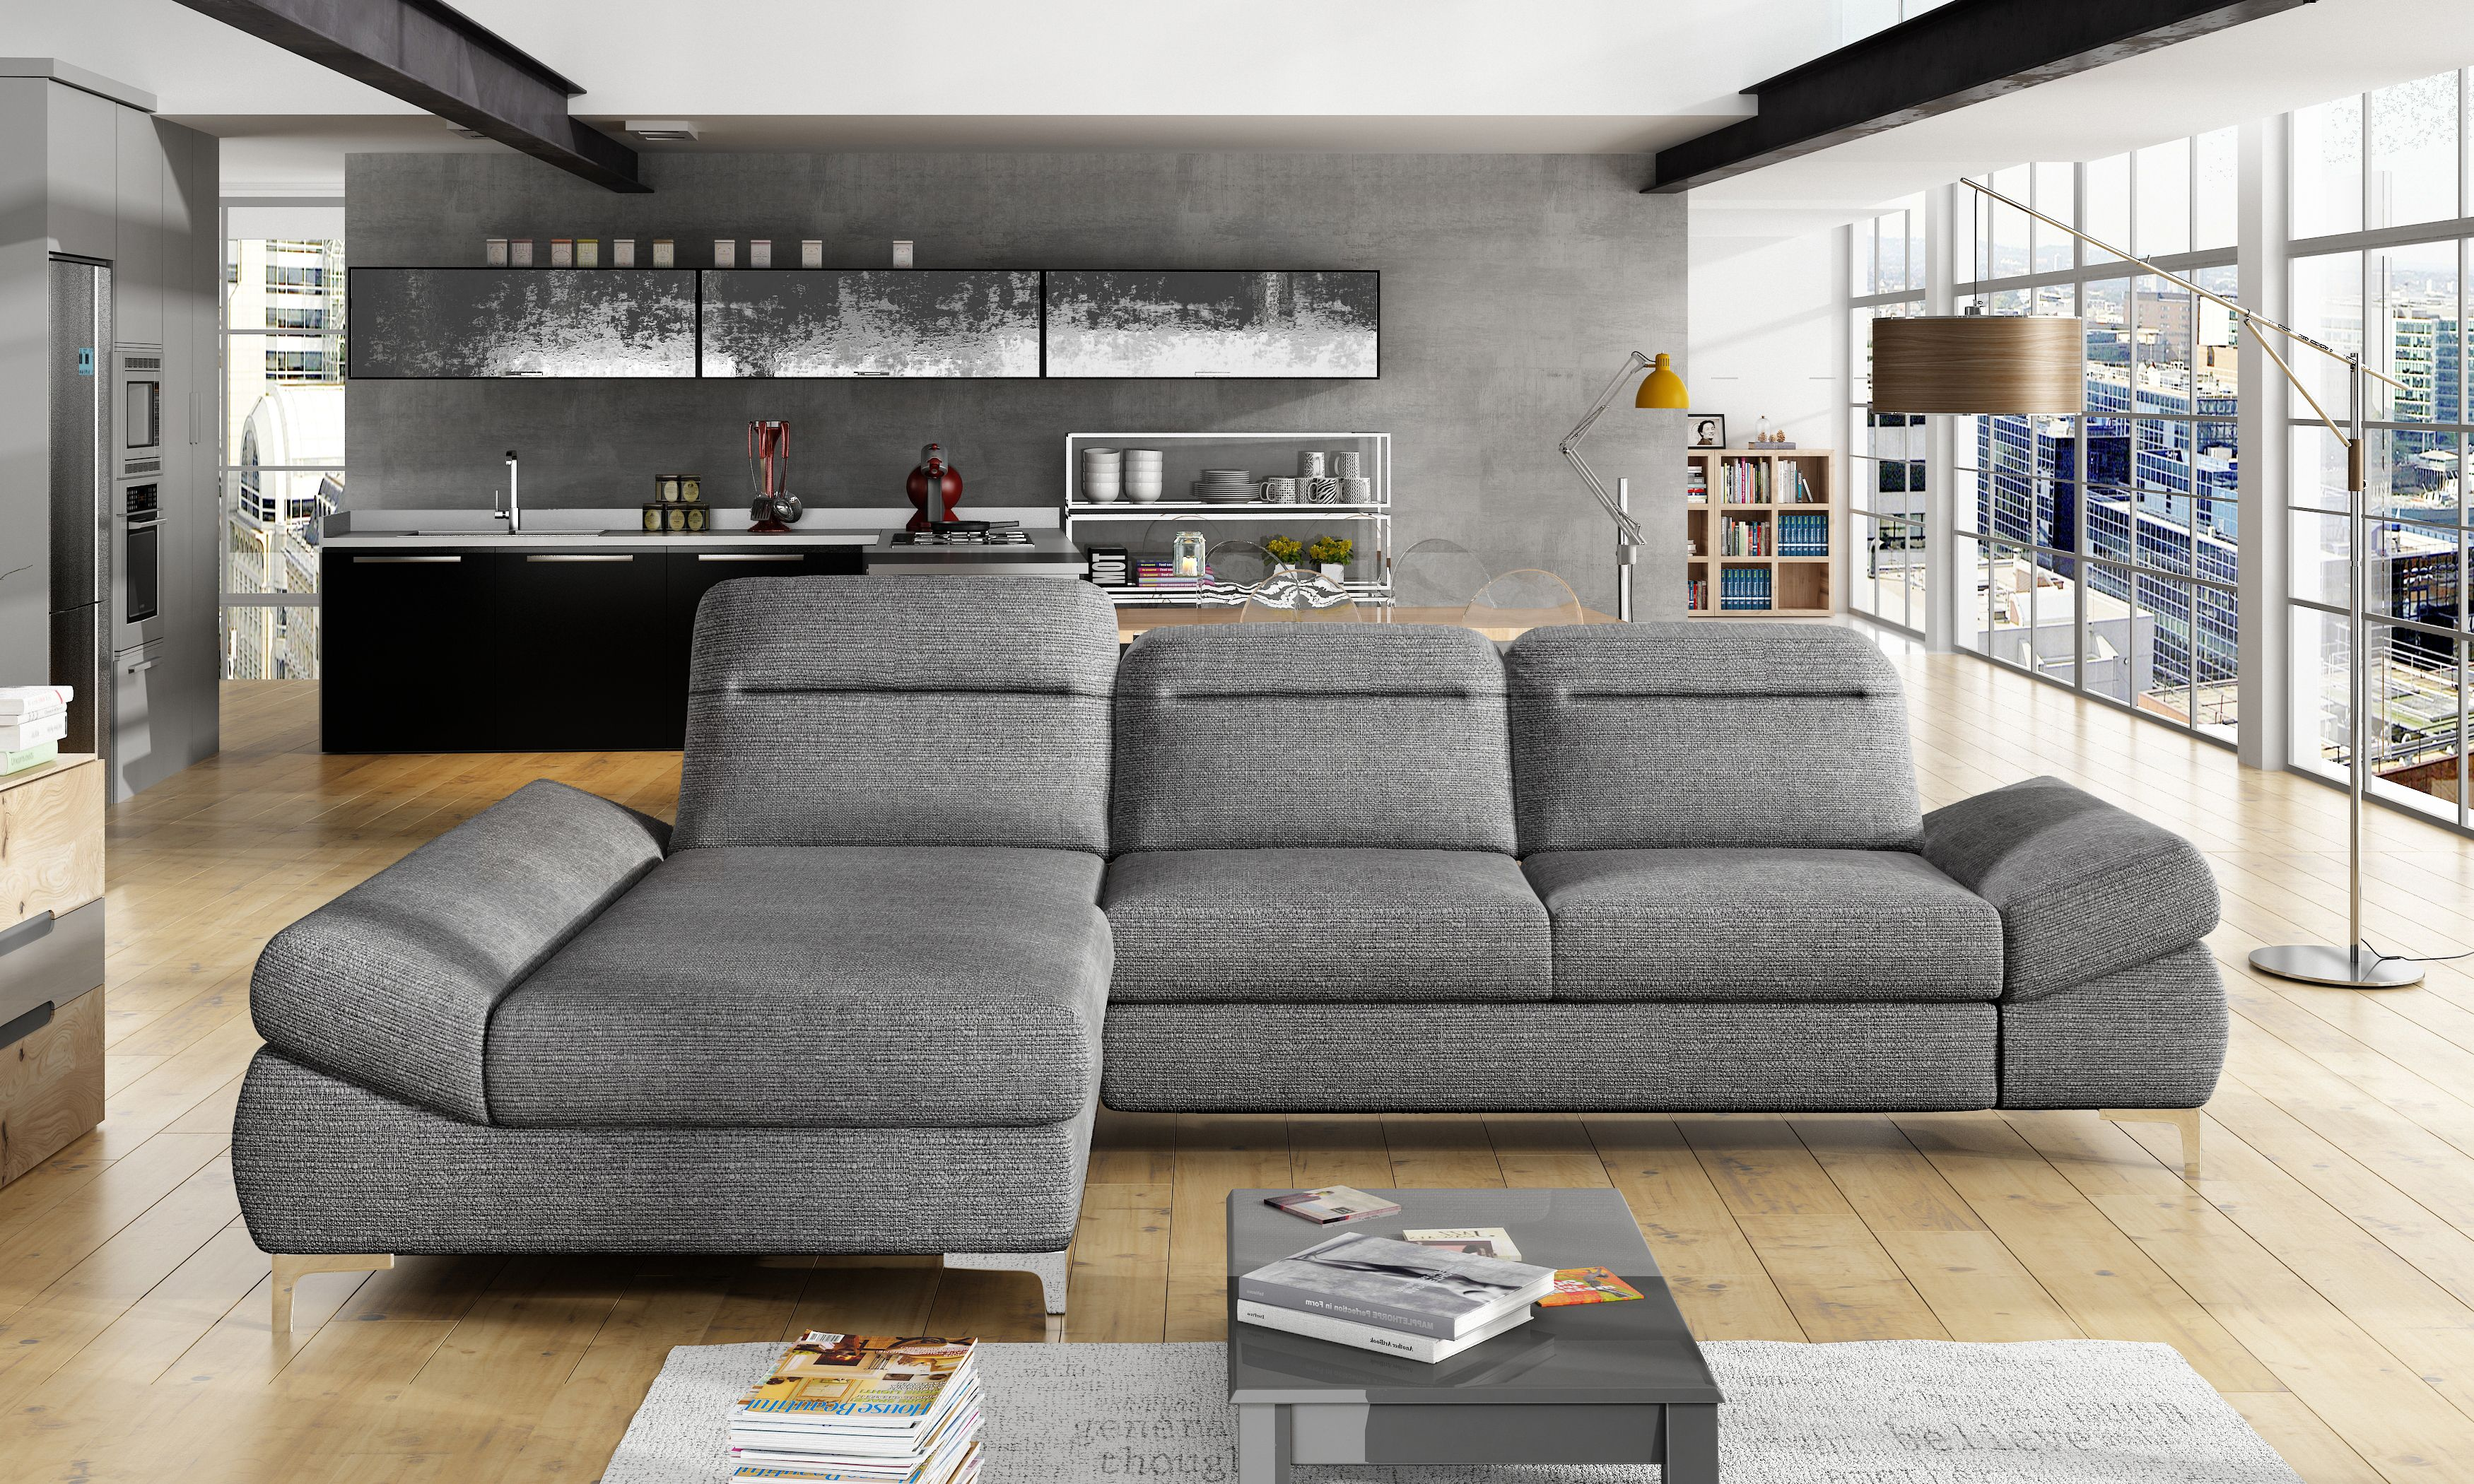 Timola Mini Classic Sofa Home Decor Sectional Couch